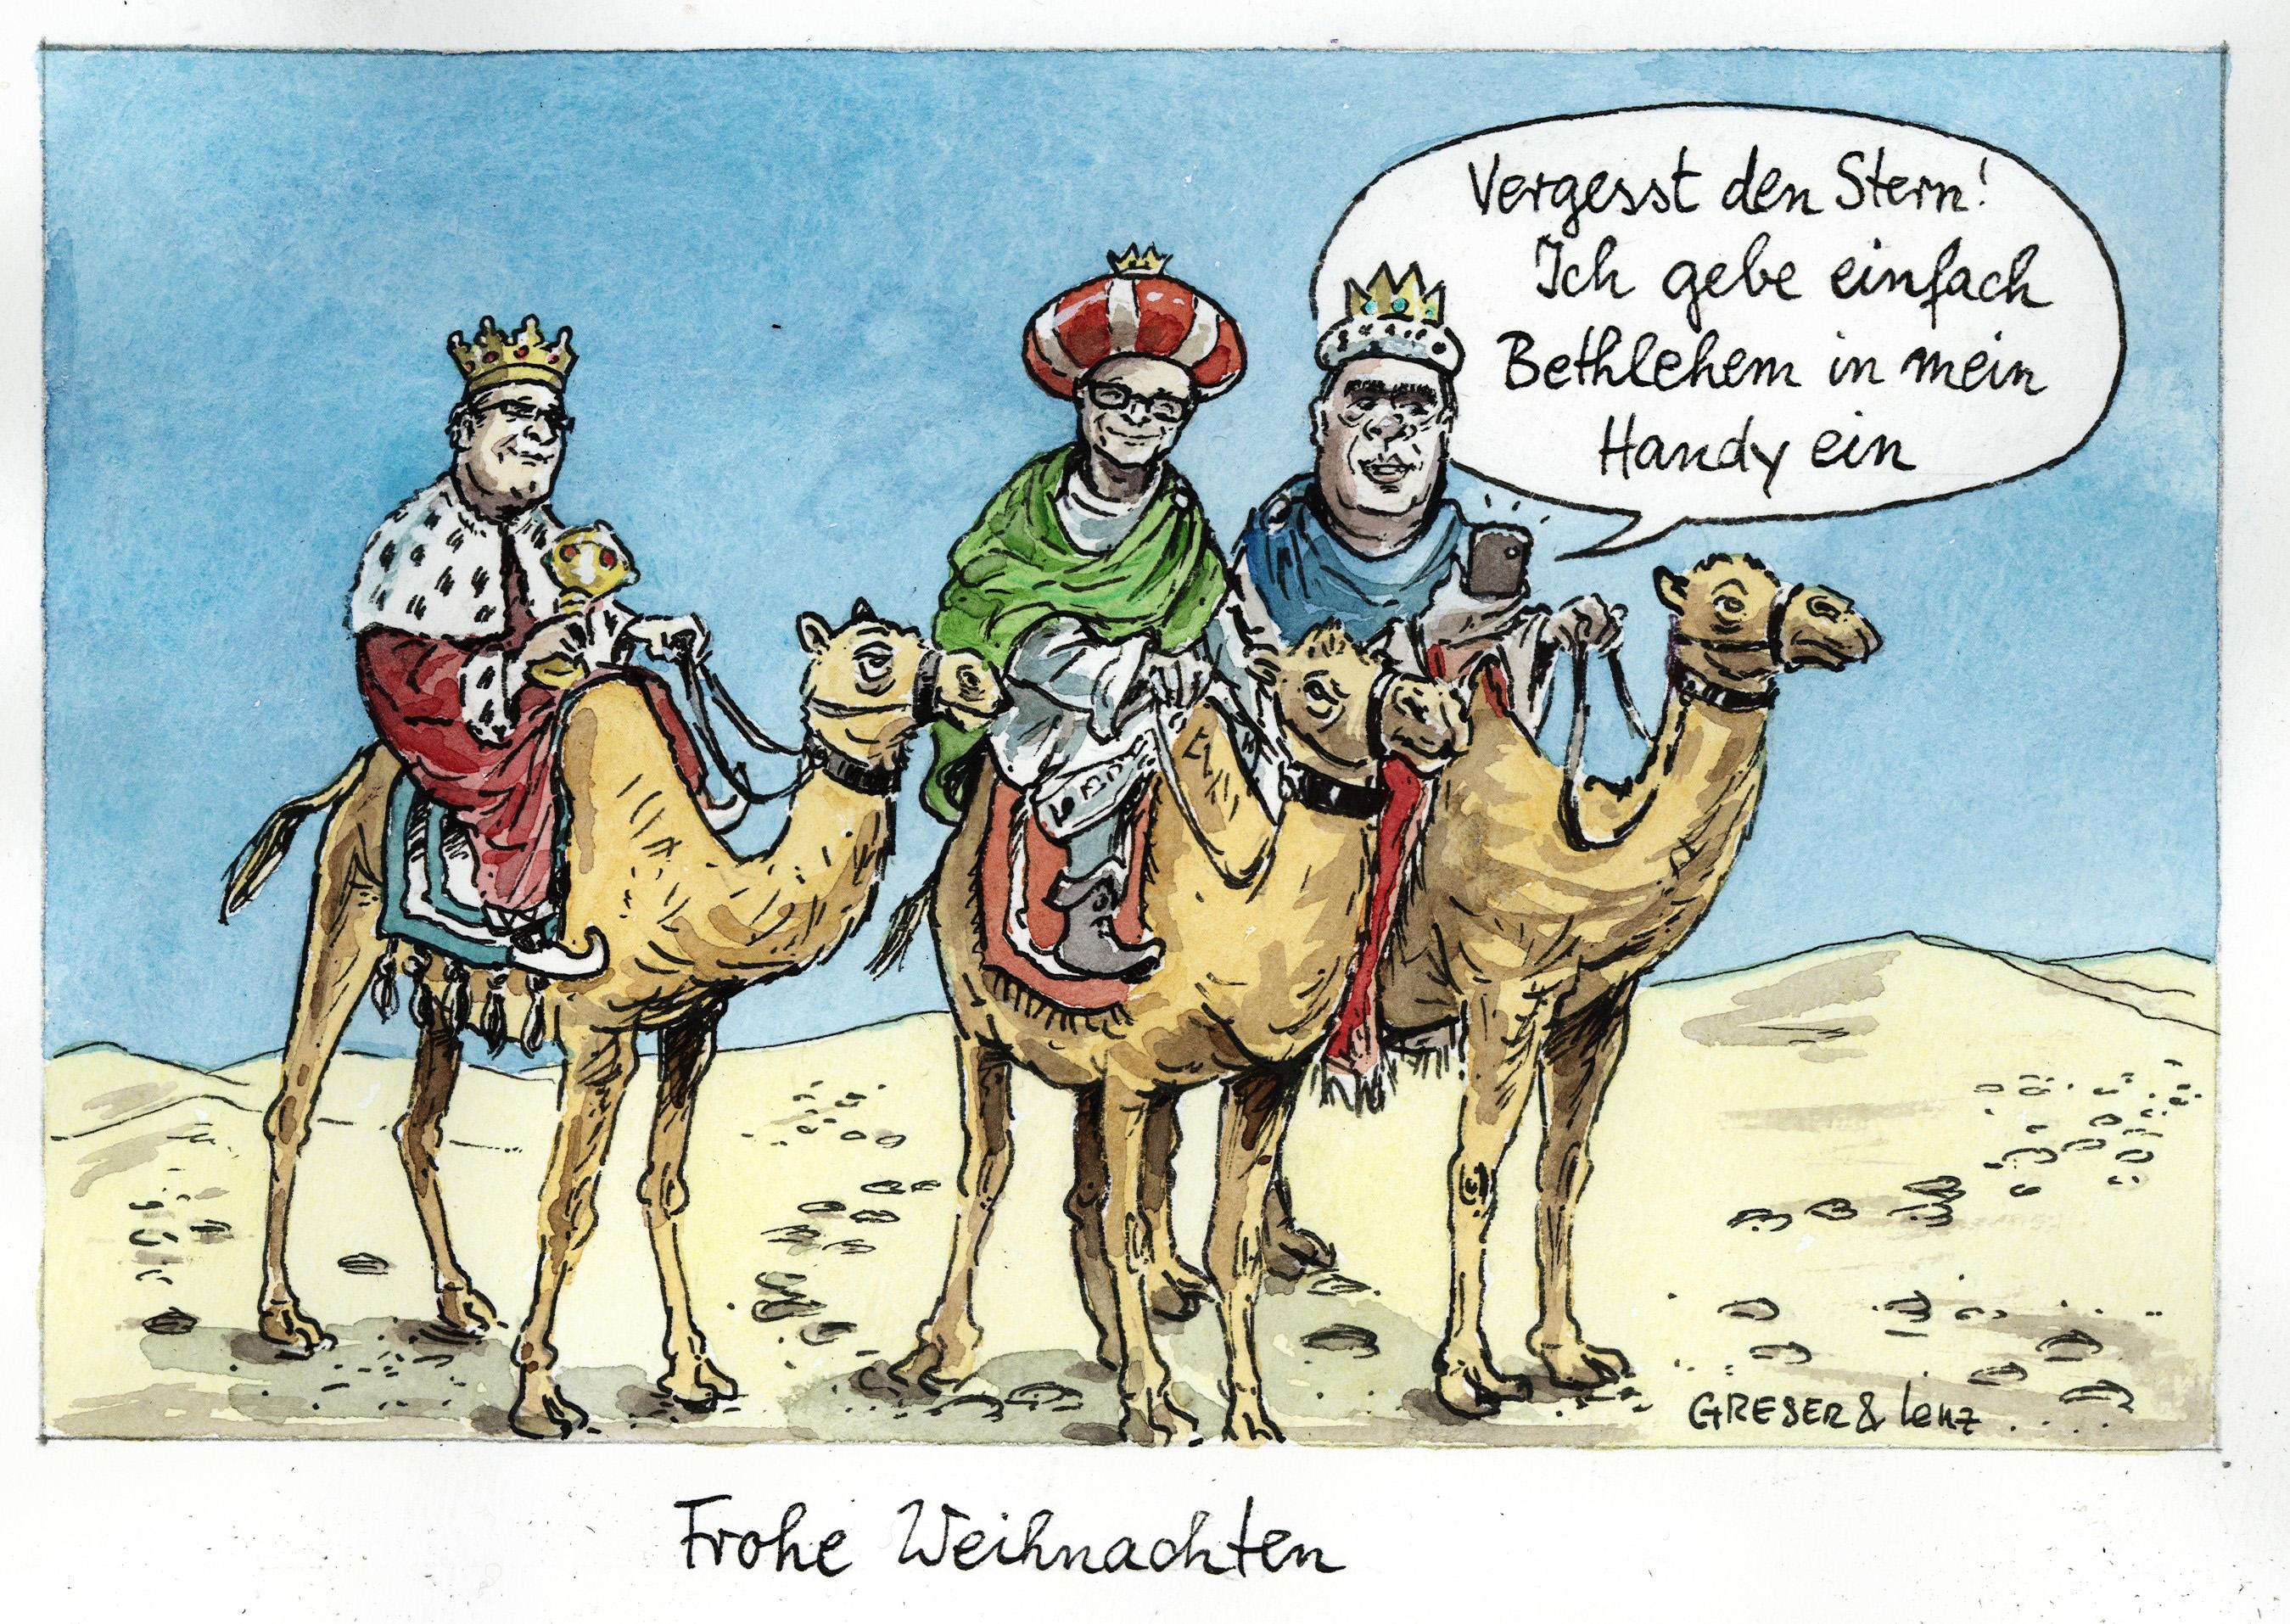 Comic Bilder Weihnachten Kostenlos.Datenschutz Cartoons Gdd E V